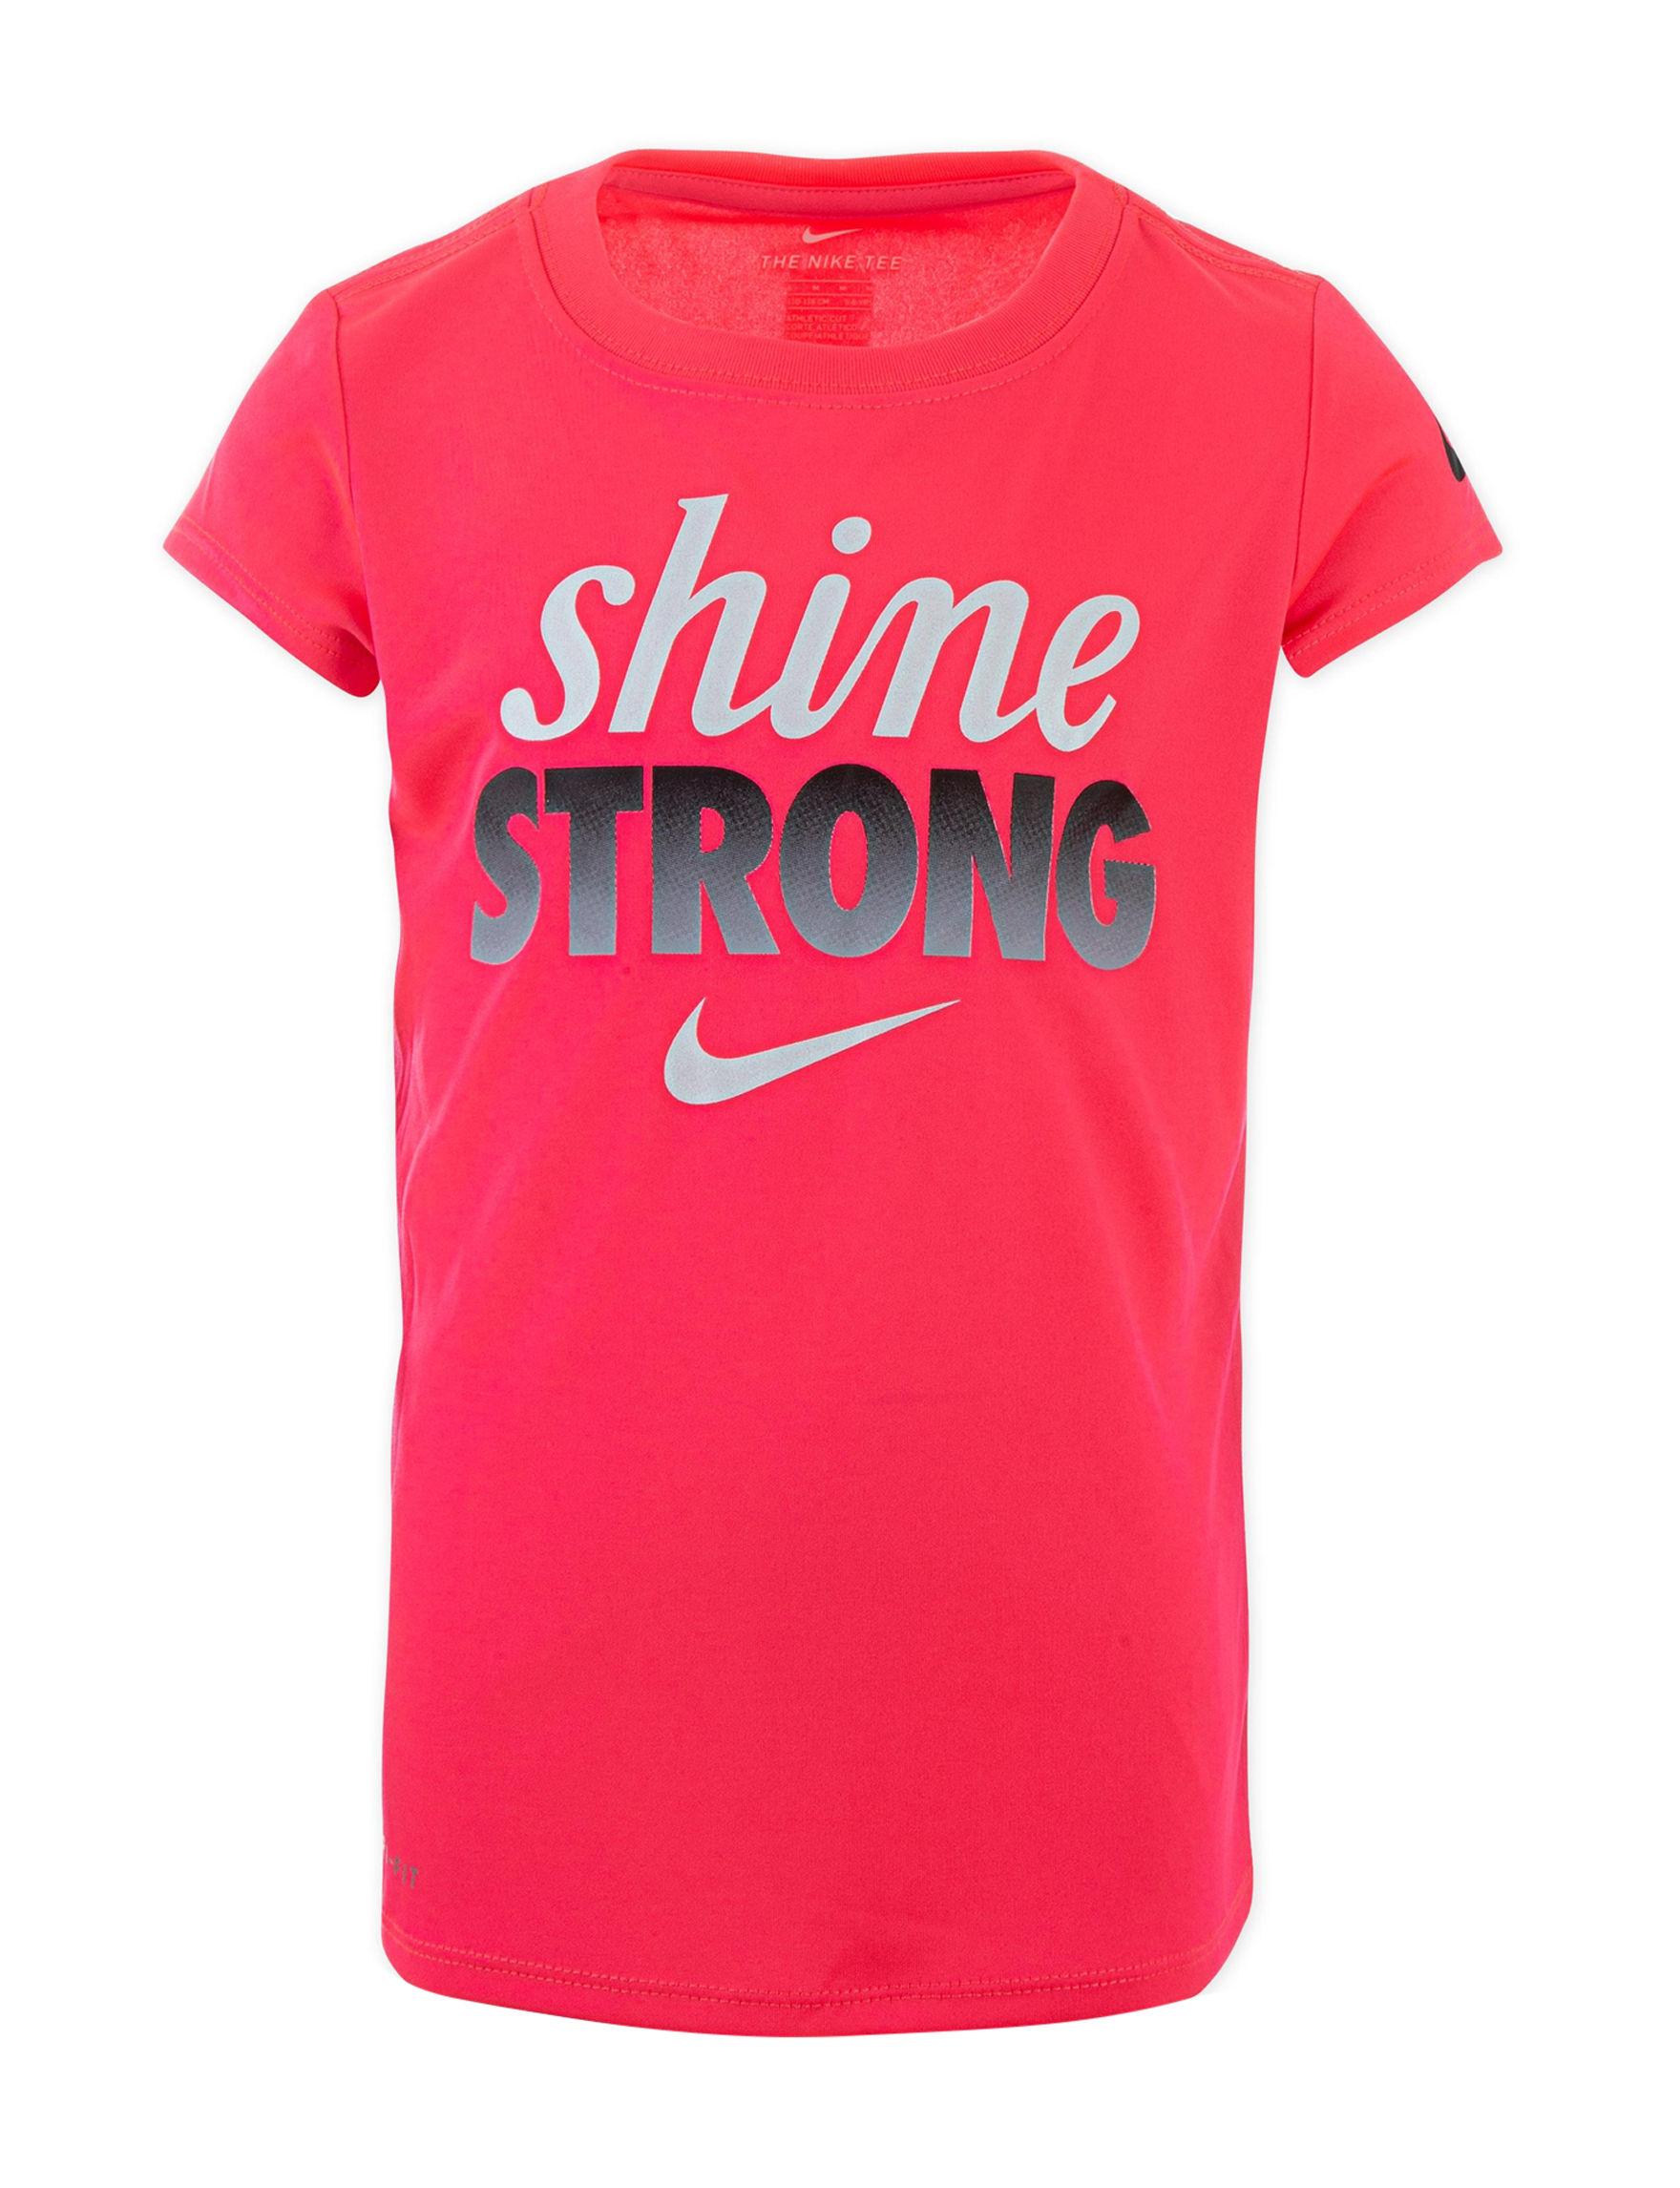 Nike Racer Pink Tees & Tanks